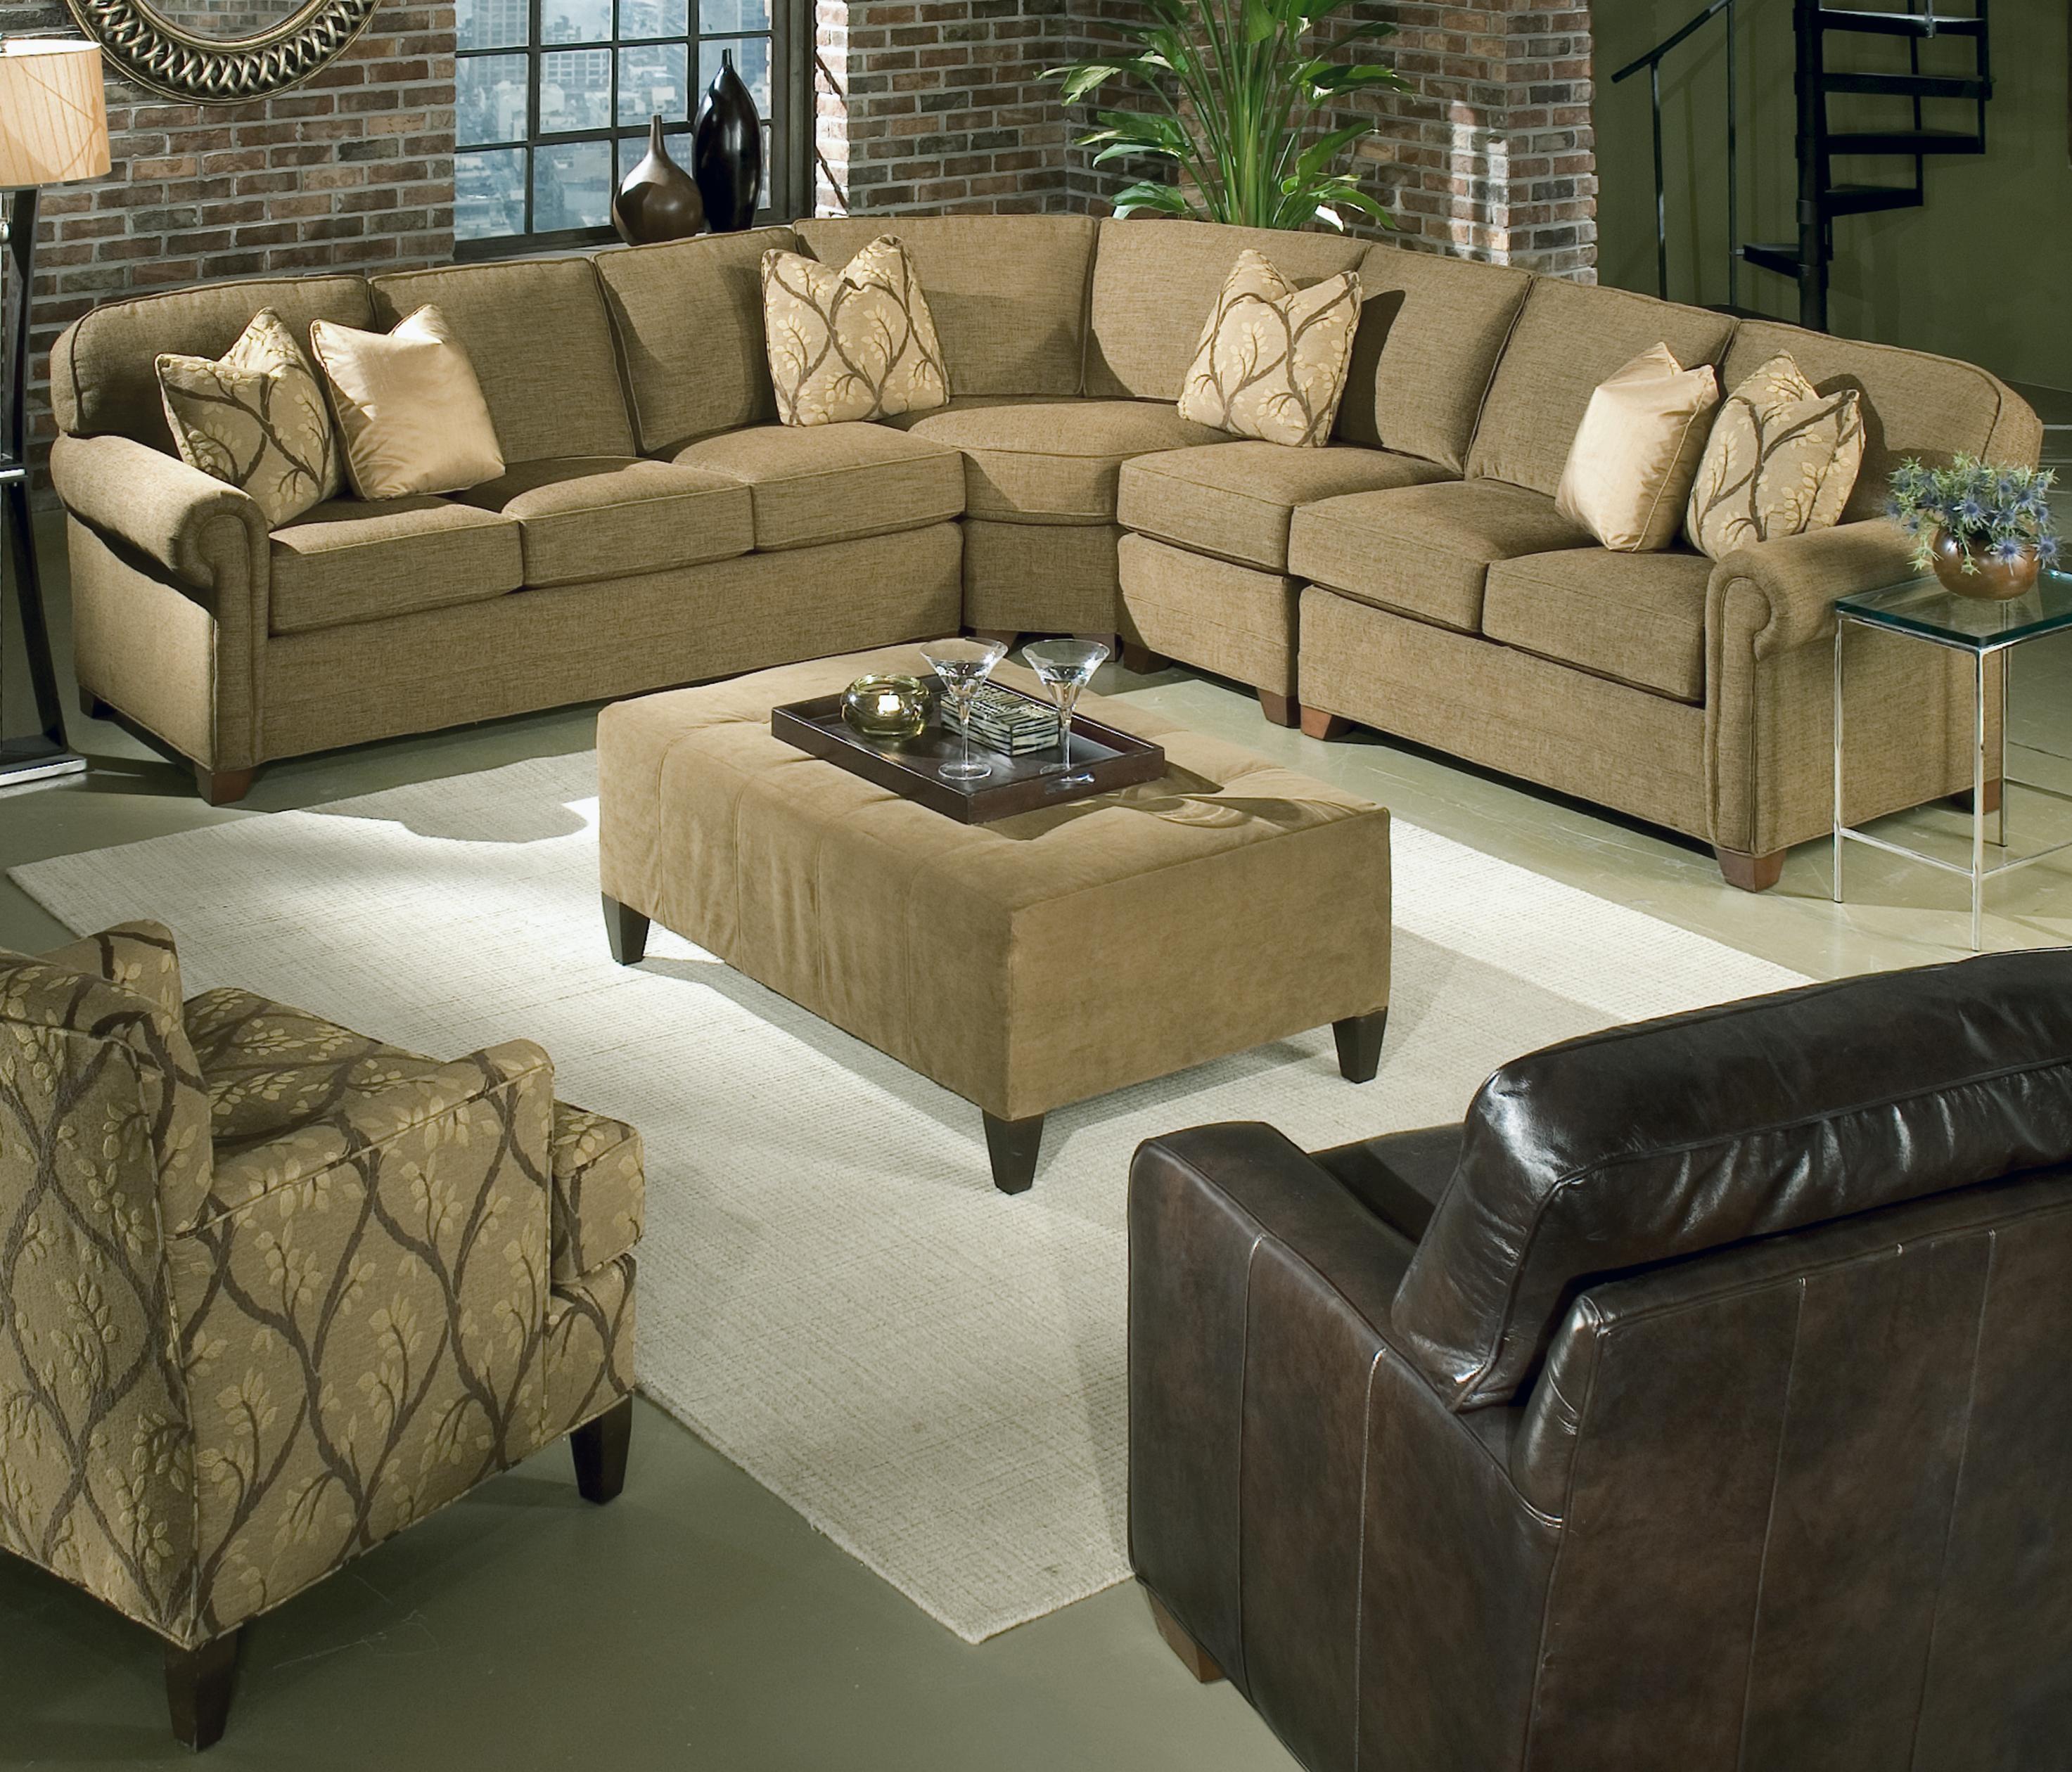 Inspirational Customizable Sectional Sofa 19 For Down Feather For Down Feather Sectional Sofa (View 5 of 15)